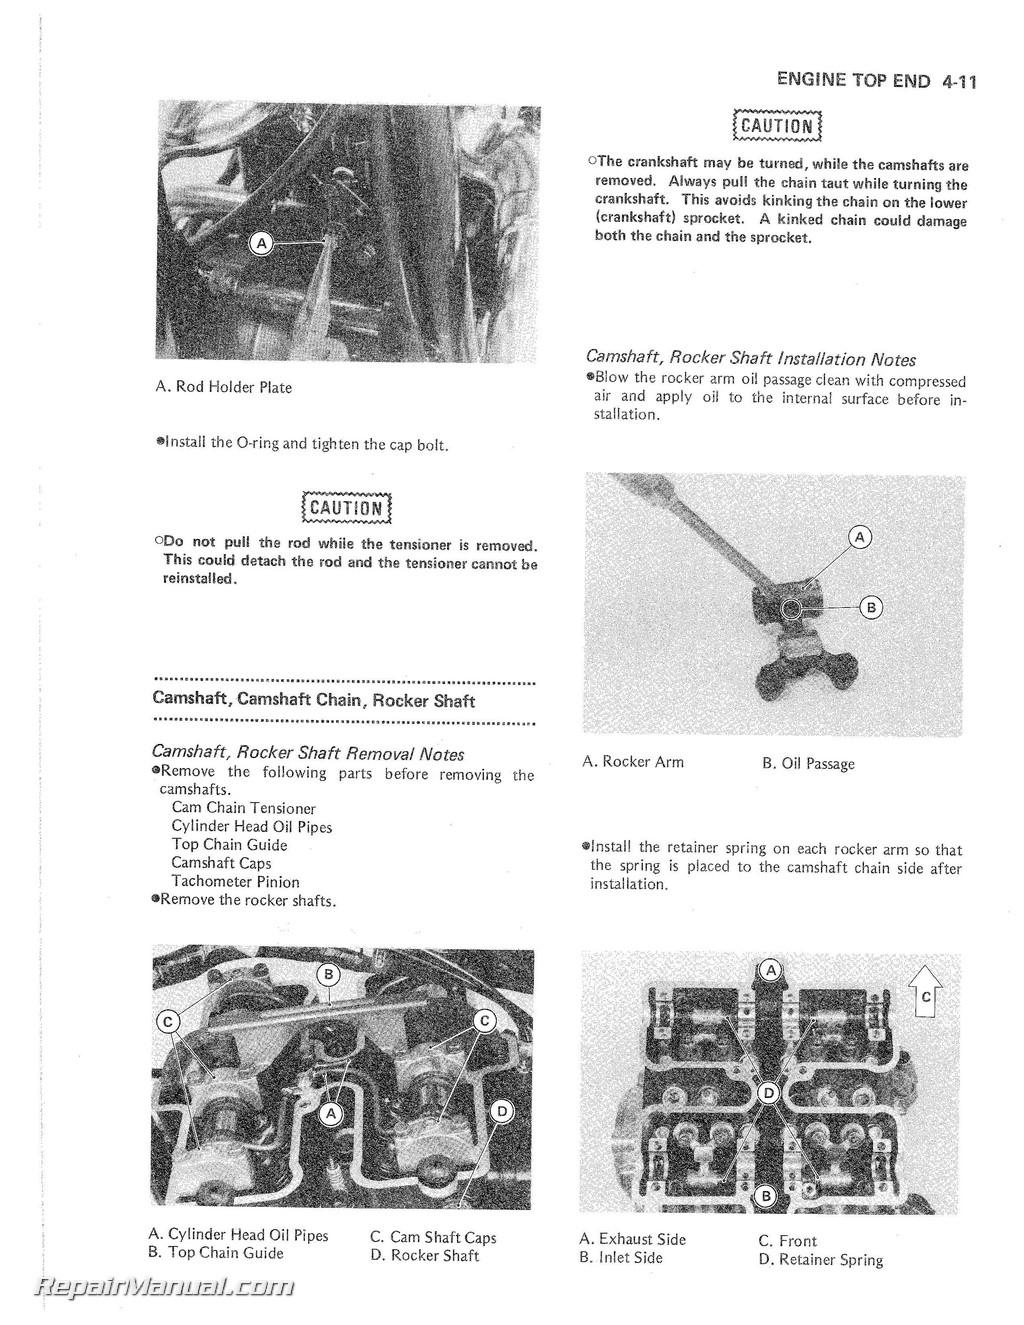 1984 kawasaki en450a1 454 ltd motorcycle service manual rh repairmanual com 454 LTD Windshields 1985 kawasaki 454 ltd service manual